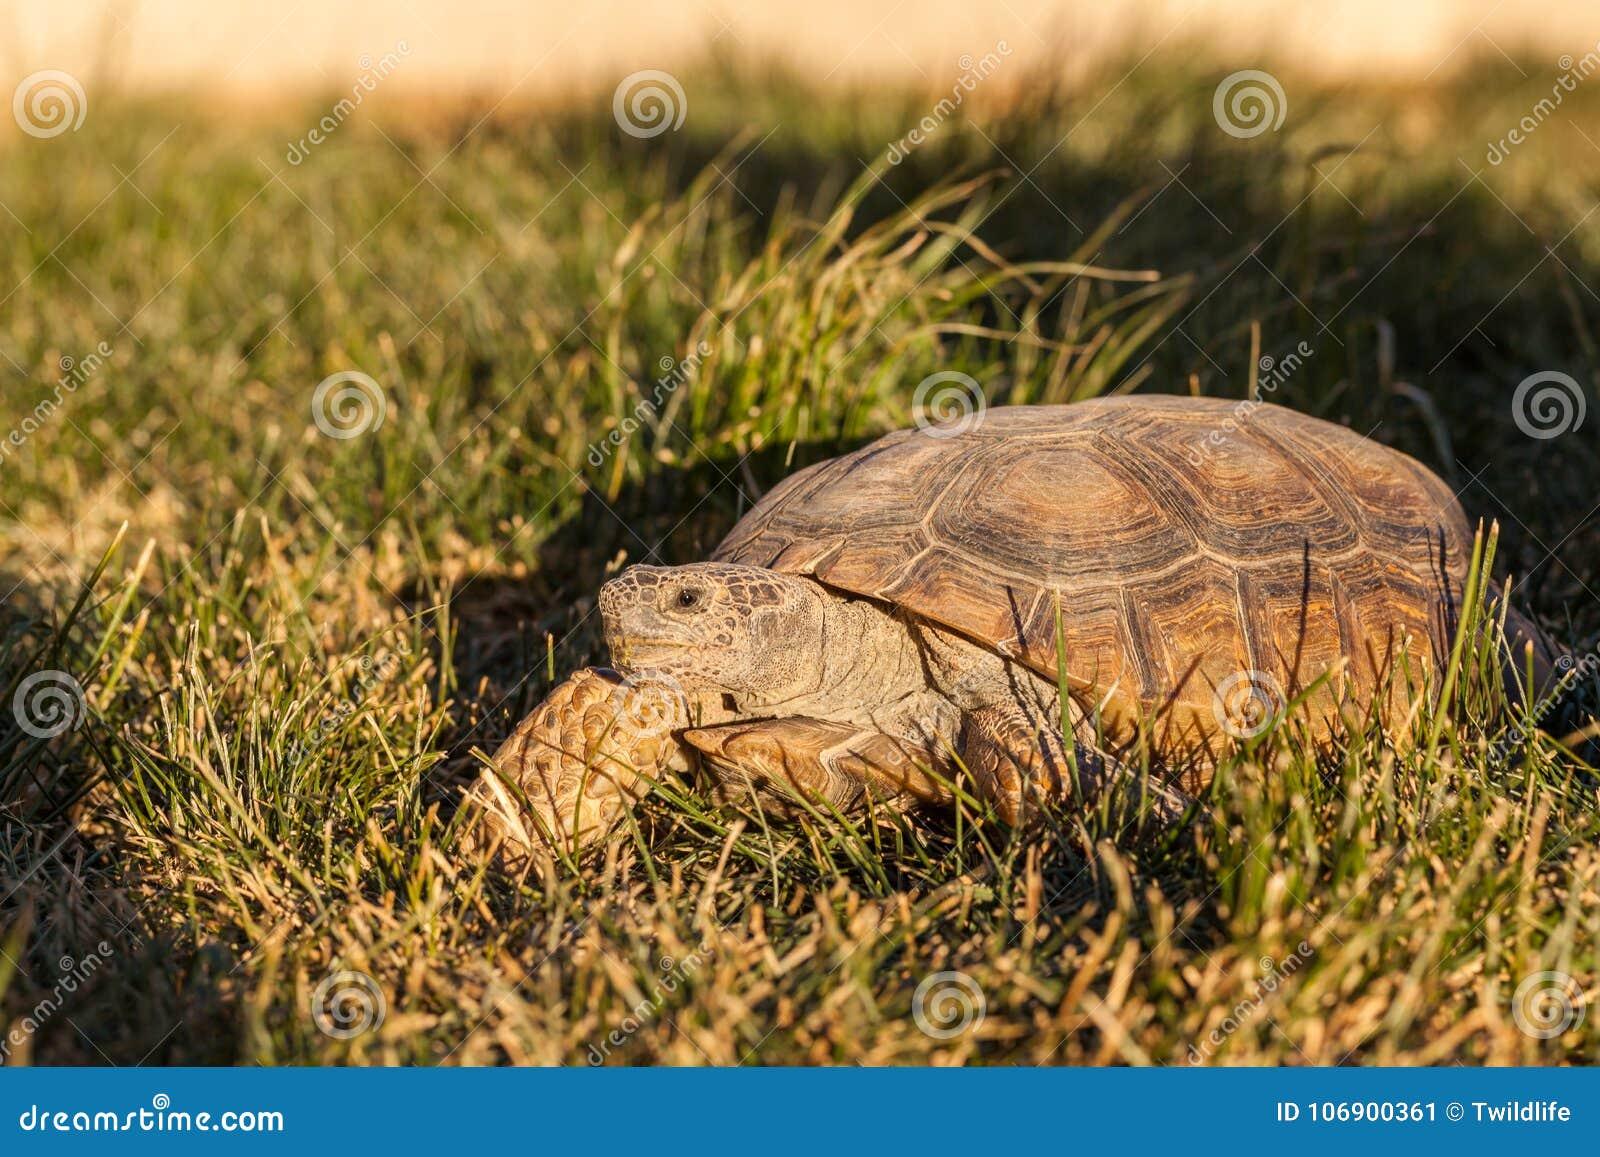 Desert Tortoise in Grass in Arizona